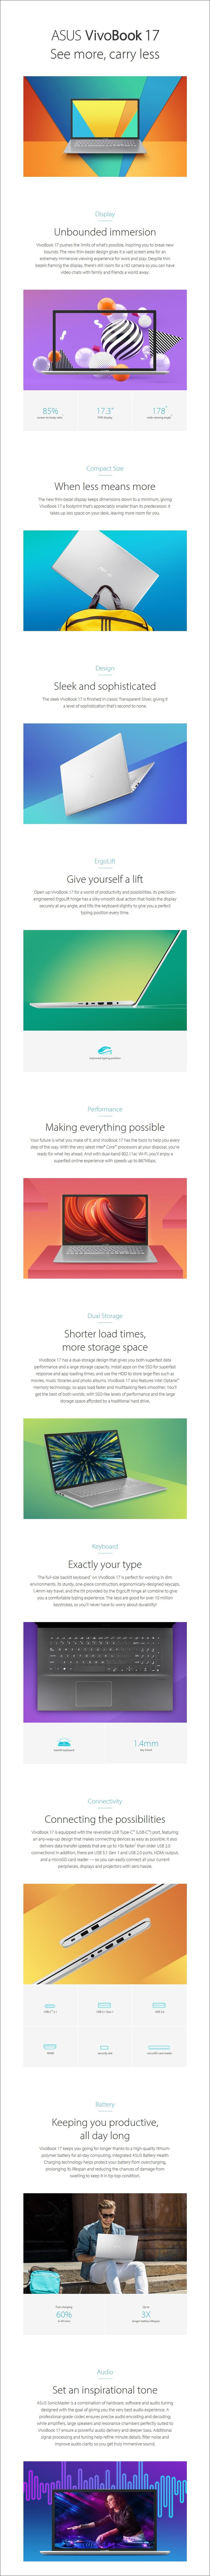 "ASUS VivoBook 17 X712FA 17.3"" Laptop i5-10210U 8GB 512GB+1TB W10H - Overview 1"